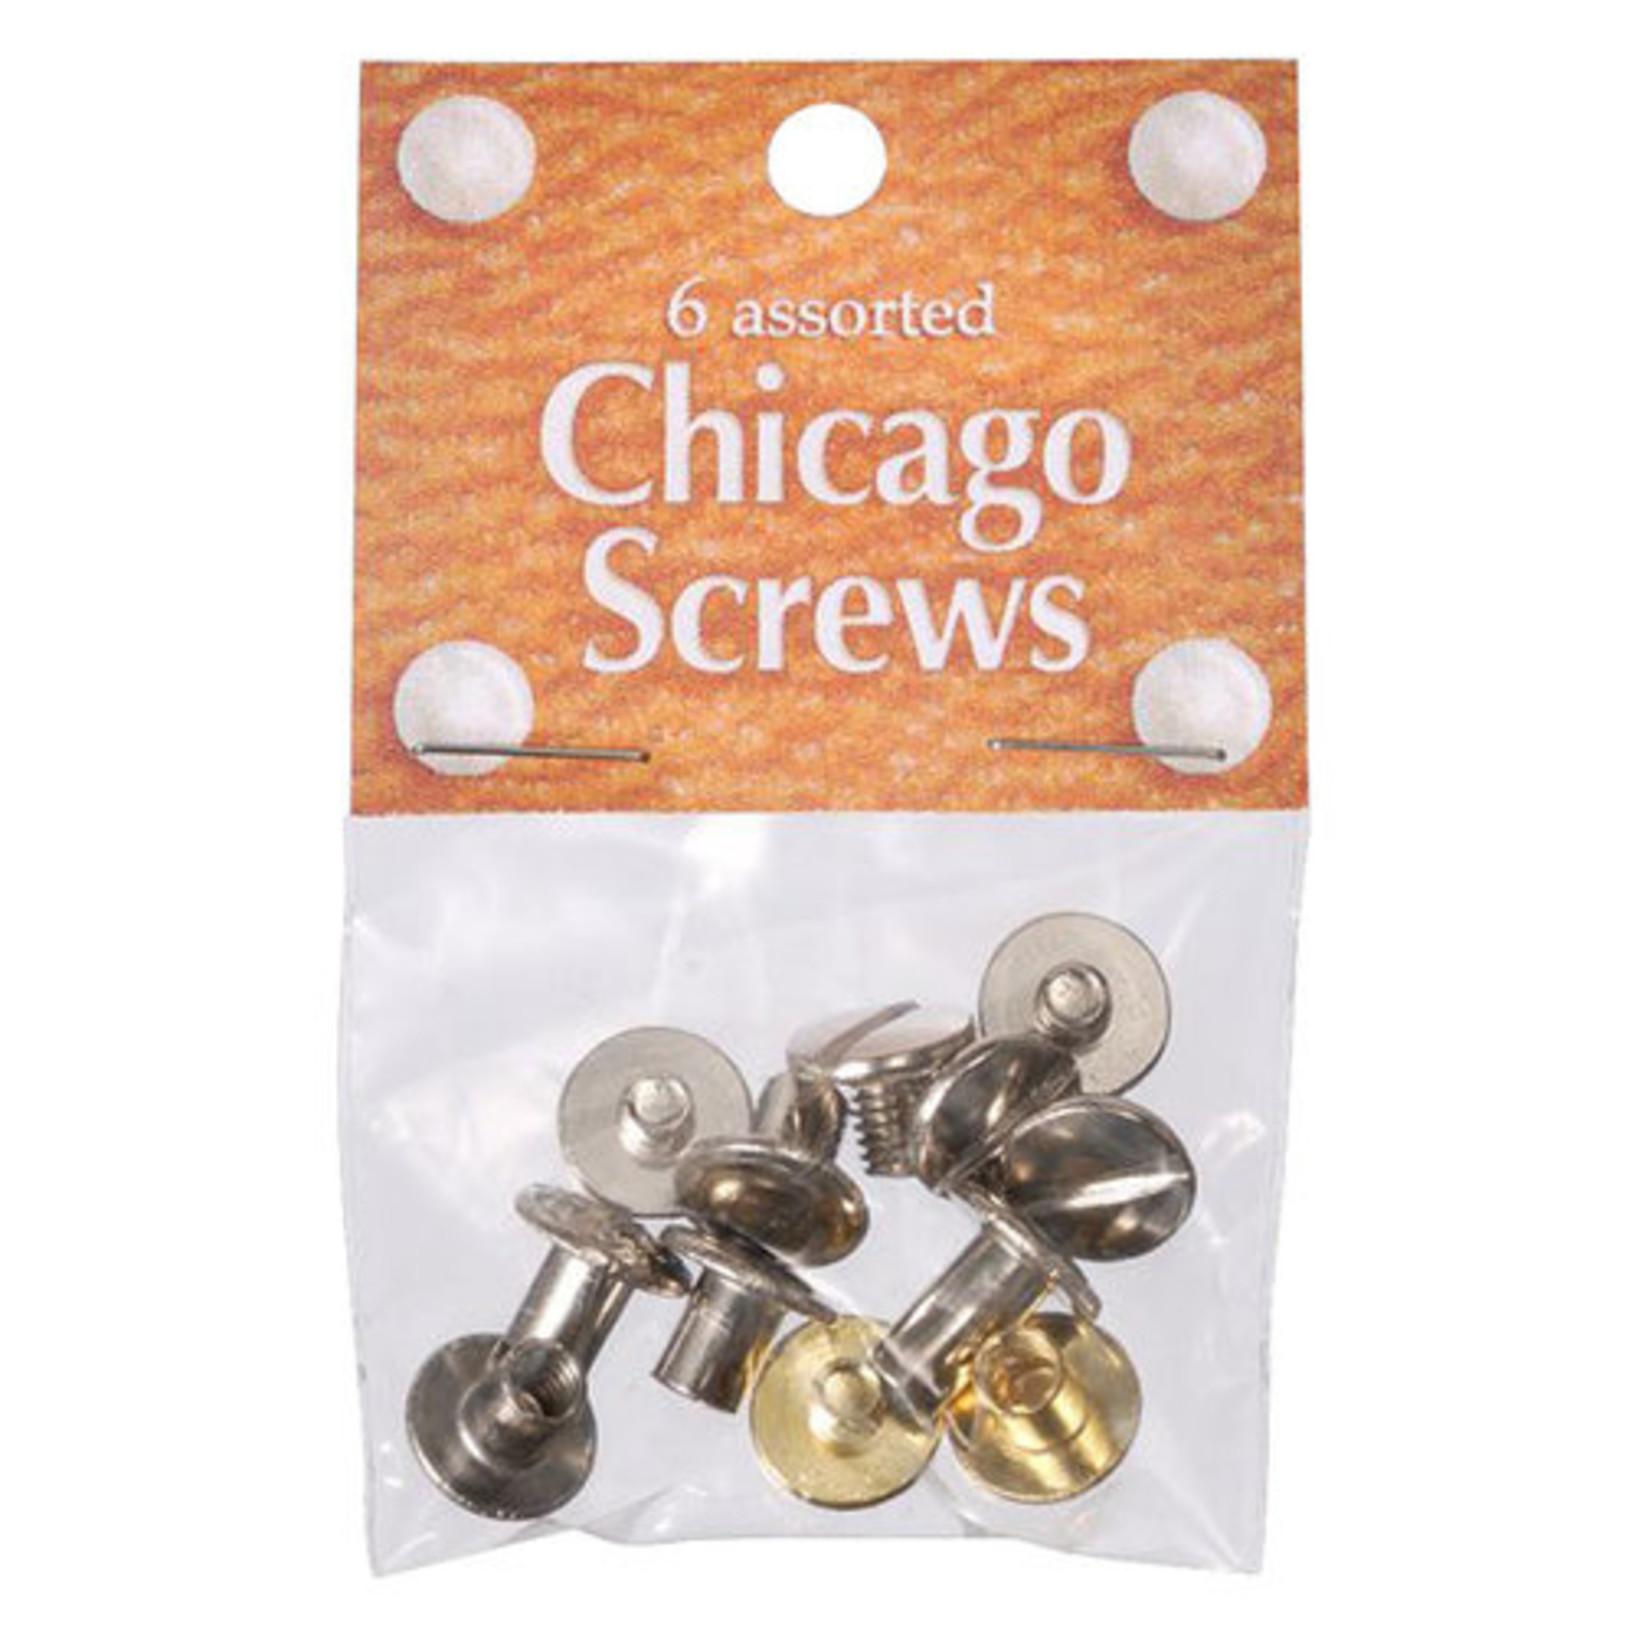 Floral Chicago Screws